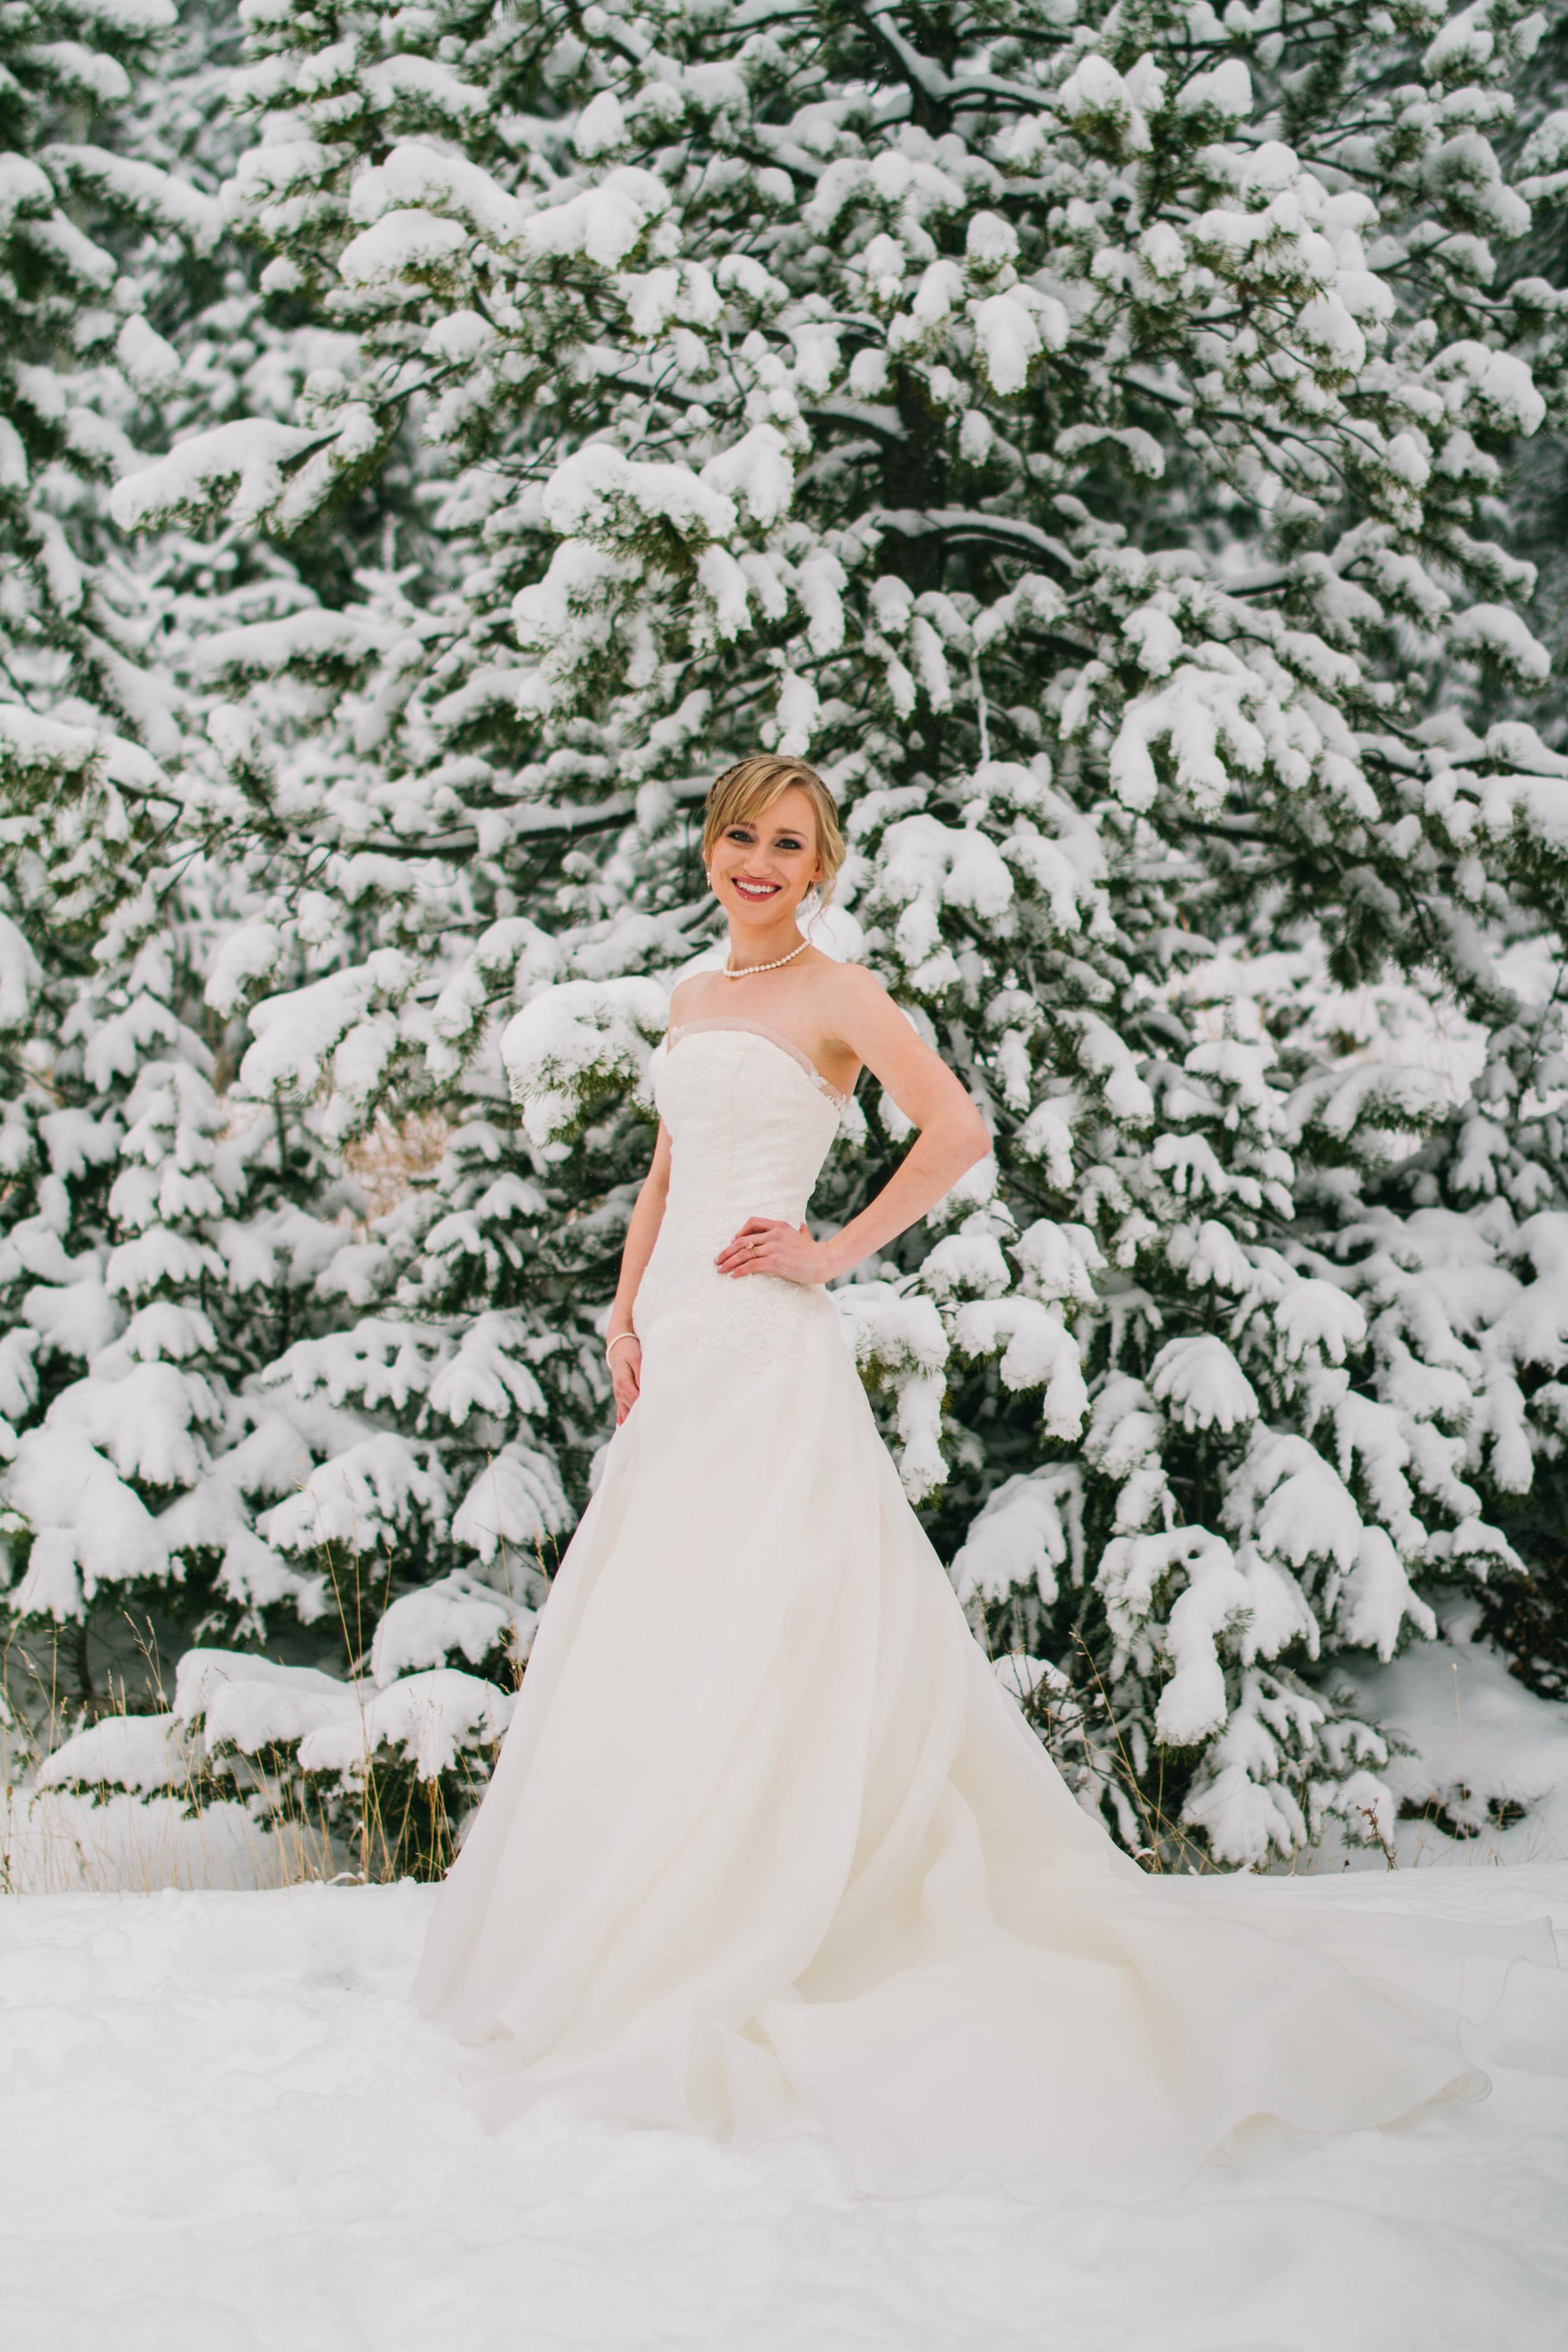 Bonin Wedding - Madeleine Bonin Photography-5817.jpg